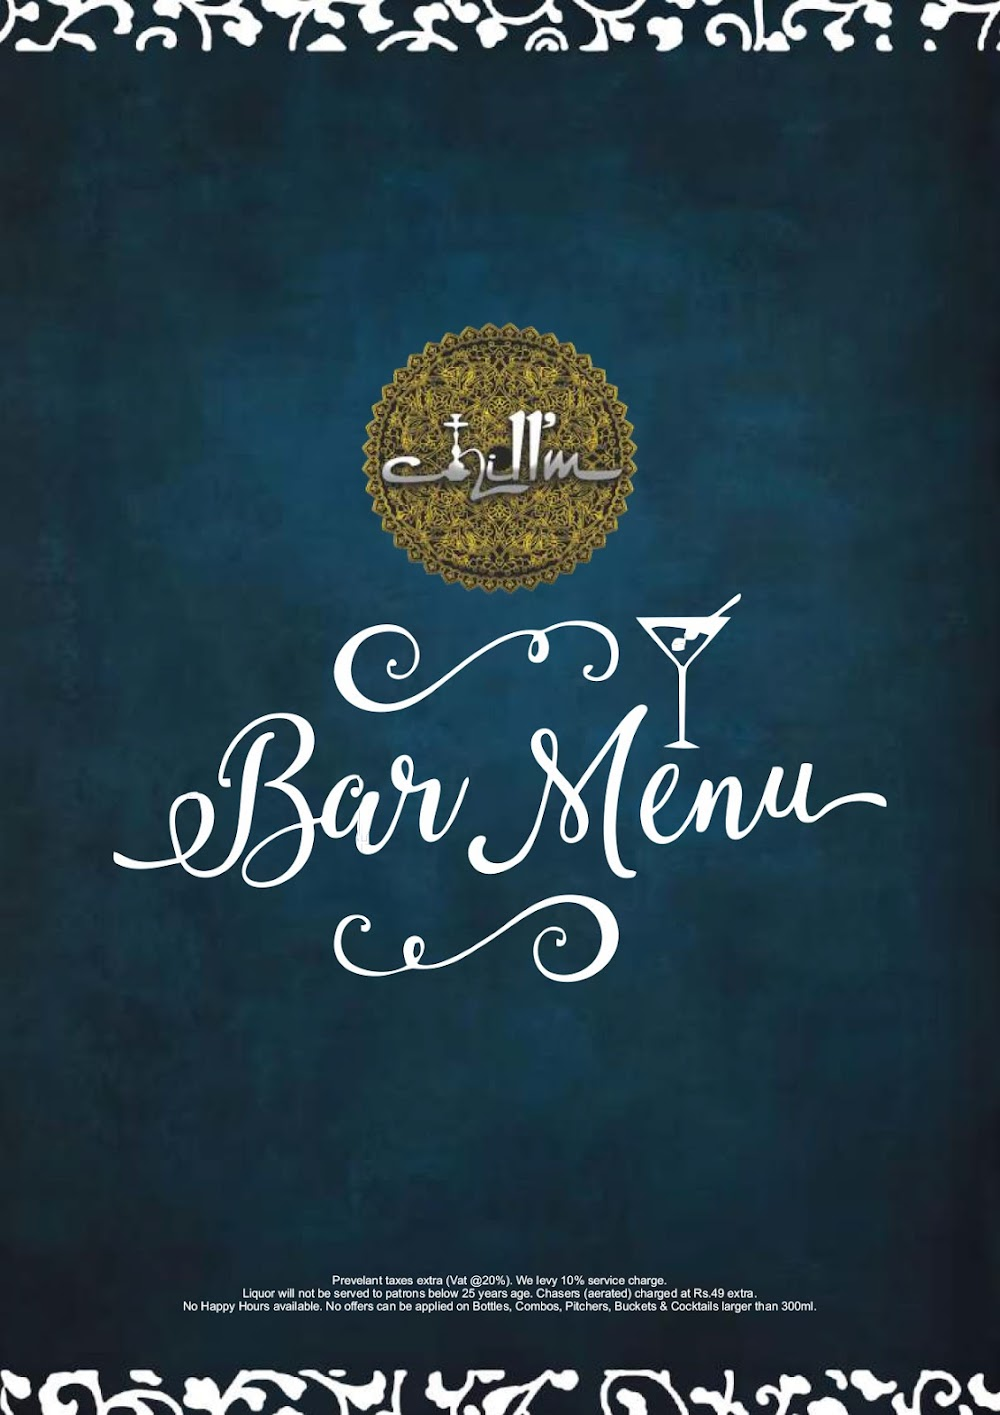 Chill'm Bar & Cafe menu 1